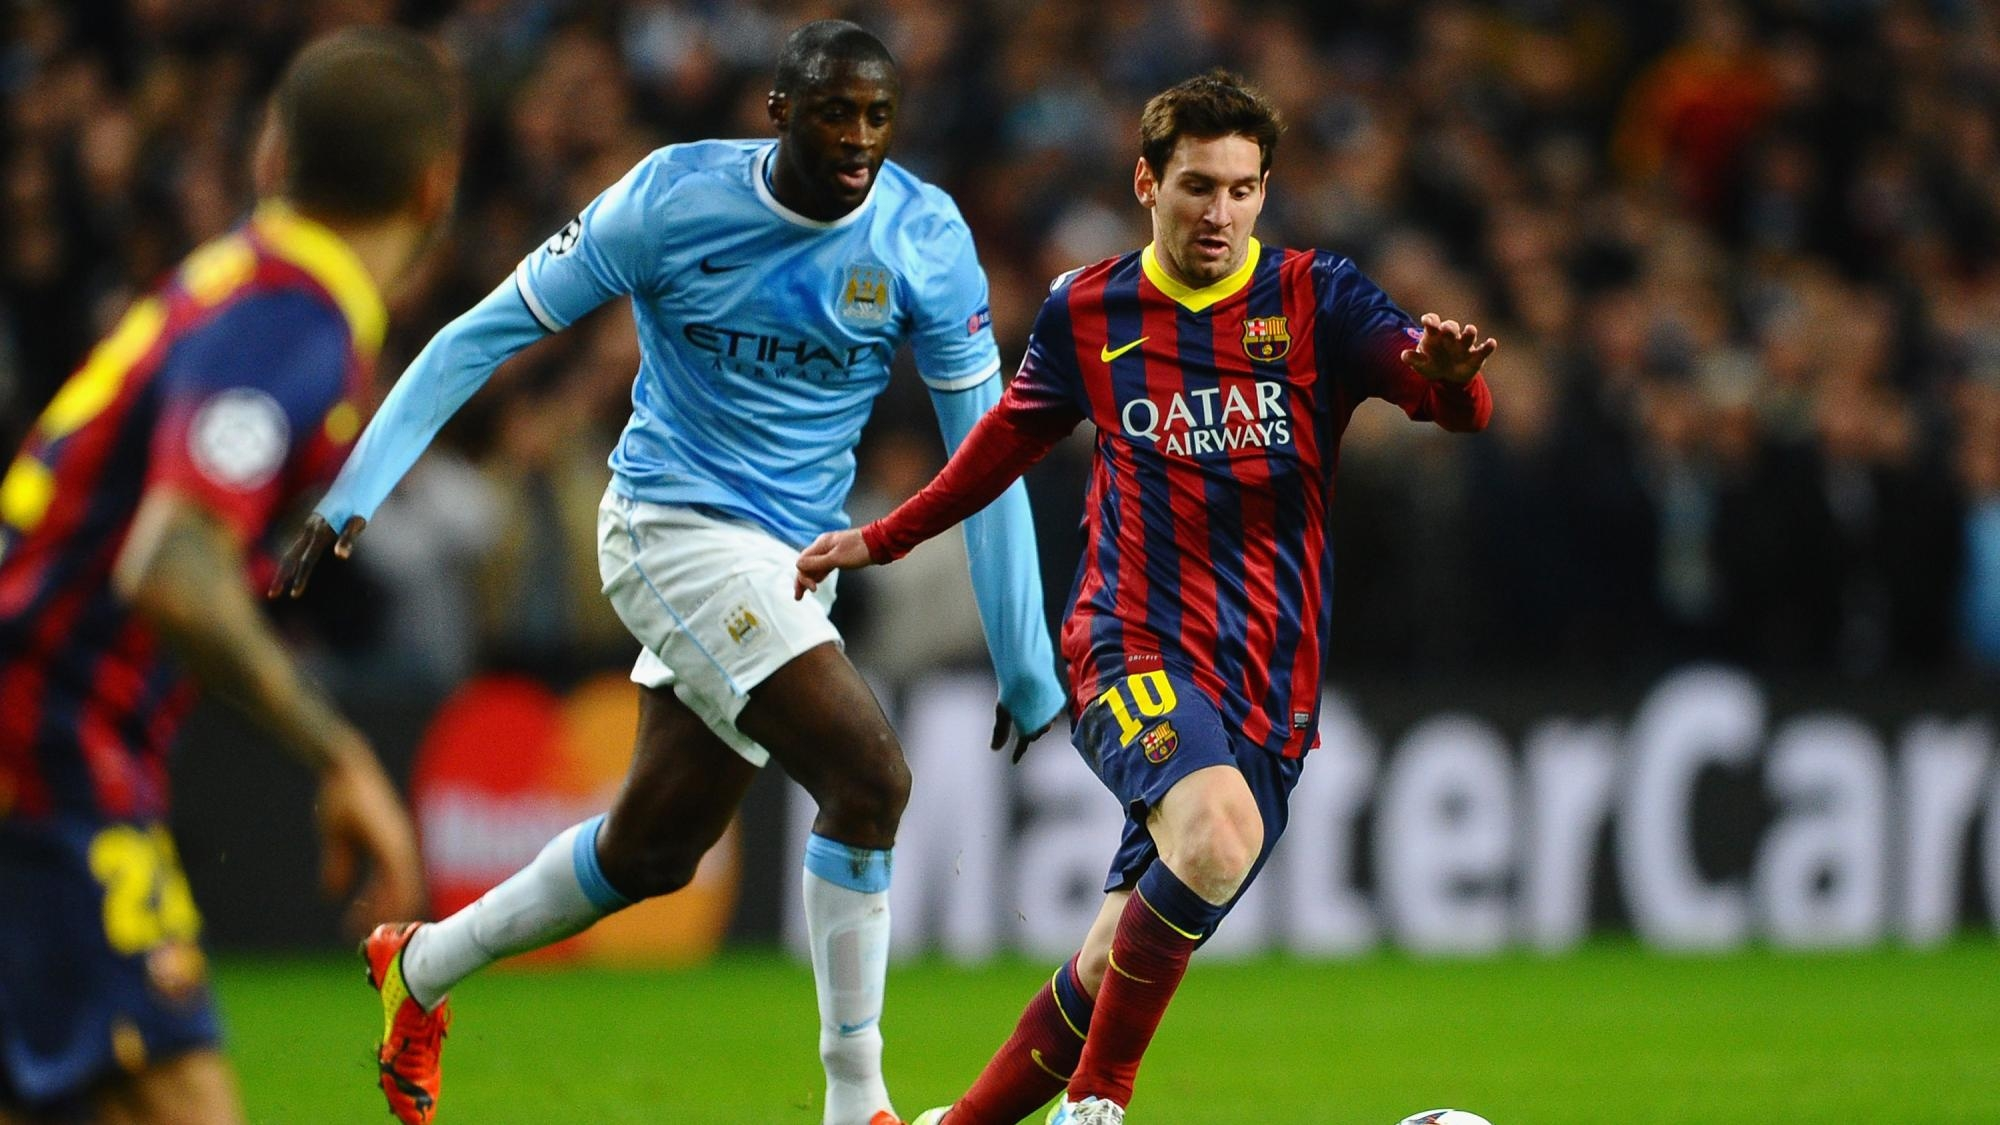 Прогноз на матч Барселона — Манчестер Сити 19.10.2016